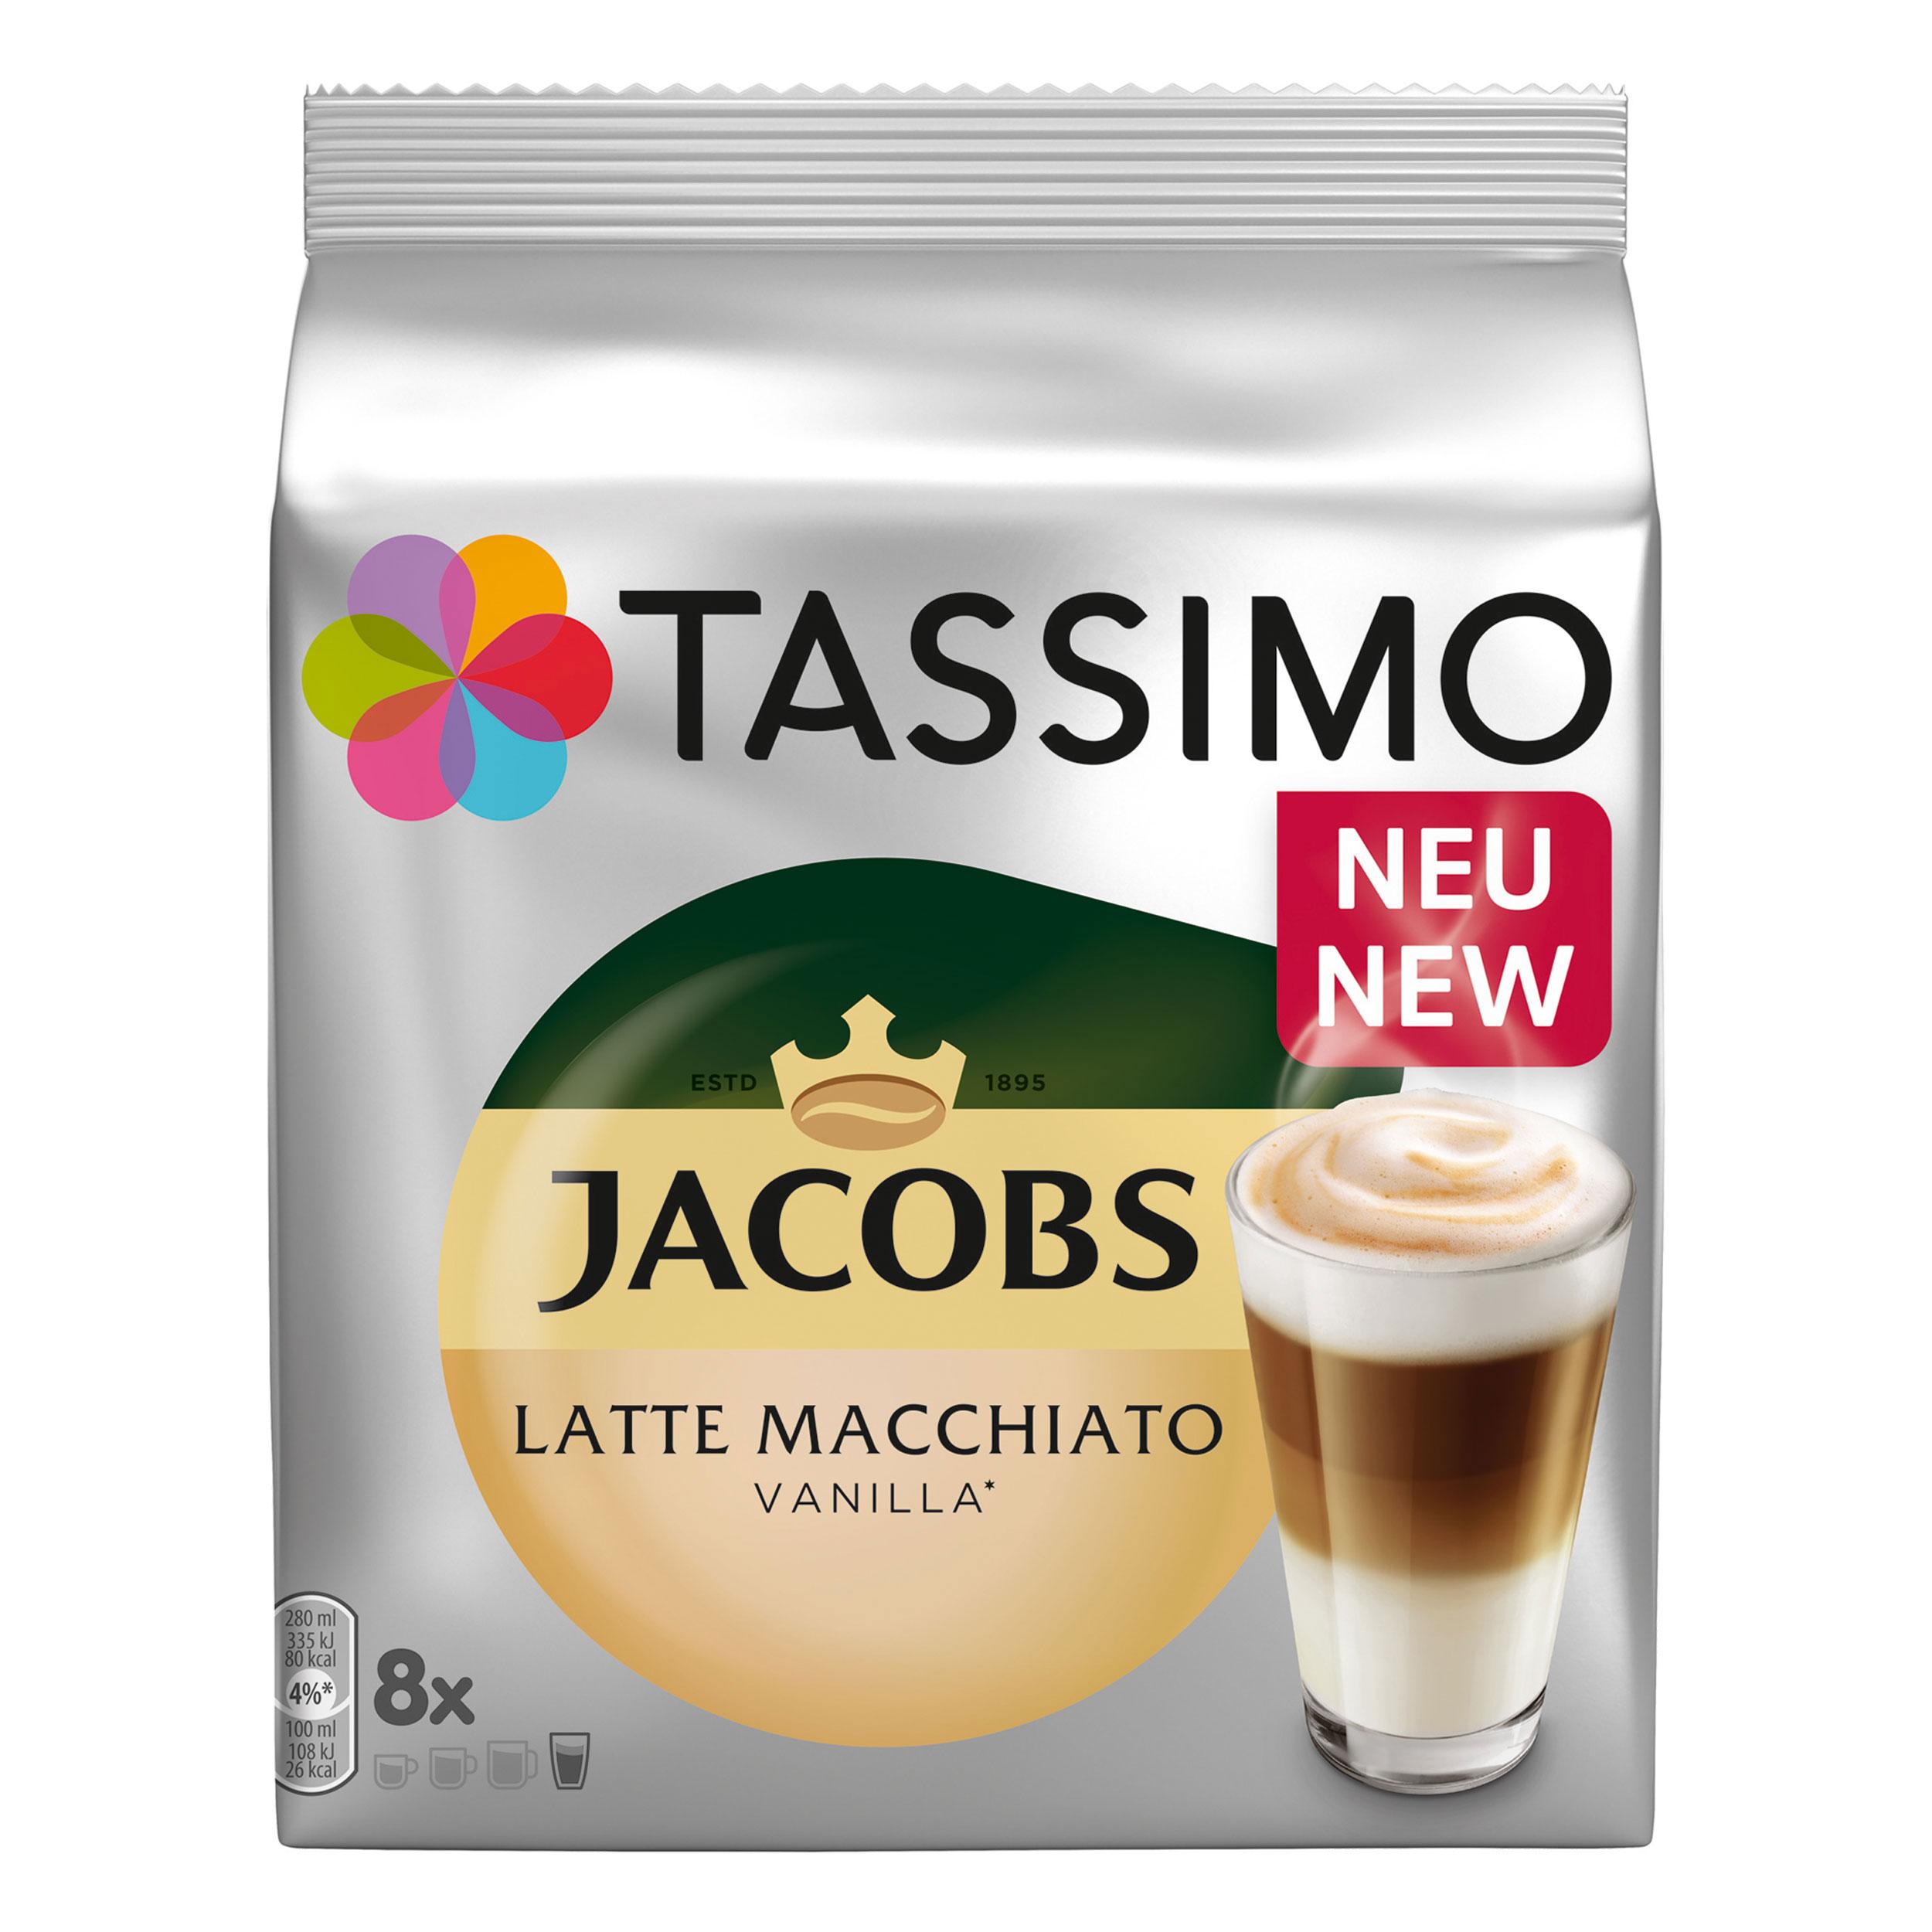 Tassimo Latte Macchiato Vanilla, Vanille Milk Coffee, Roasted, 16 T-Discs /  8 Portions at About-Tea de Shop